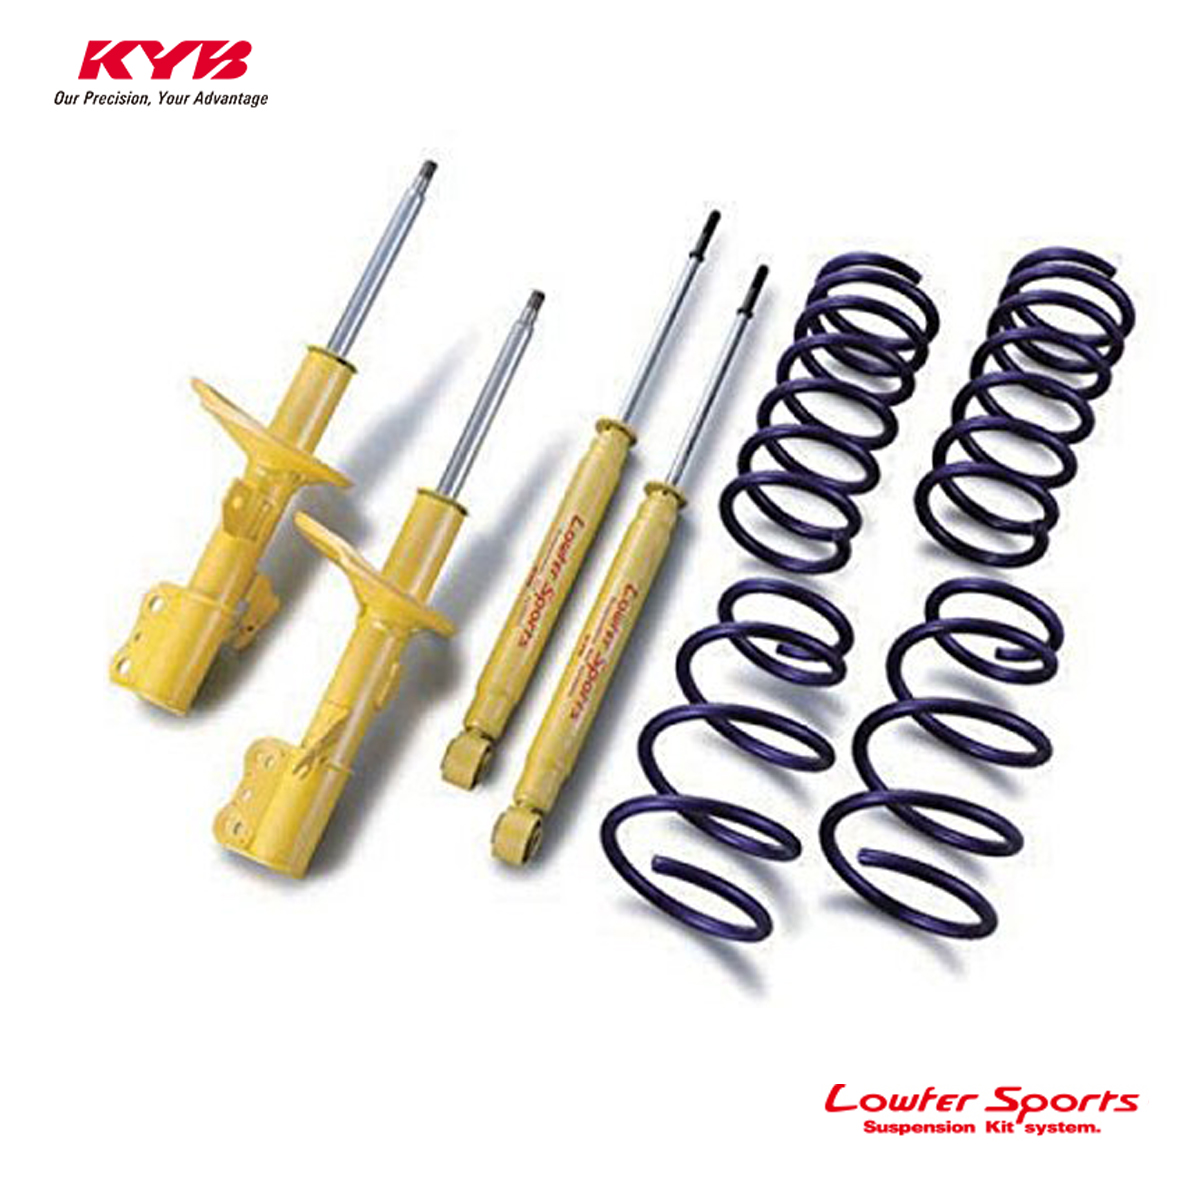 KYB カヤバ タントエグゼカスタム L455S ショックアブソーバー サスペンションキット Lowfer Sports LKIT-L455SRS 配送先条件有り